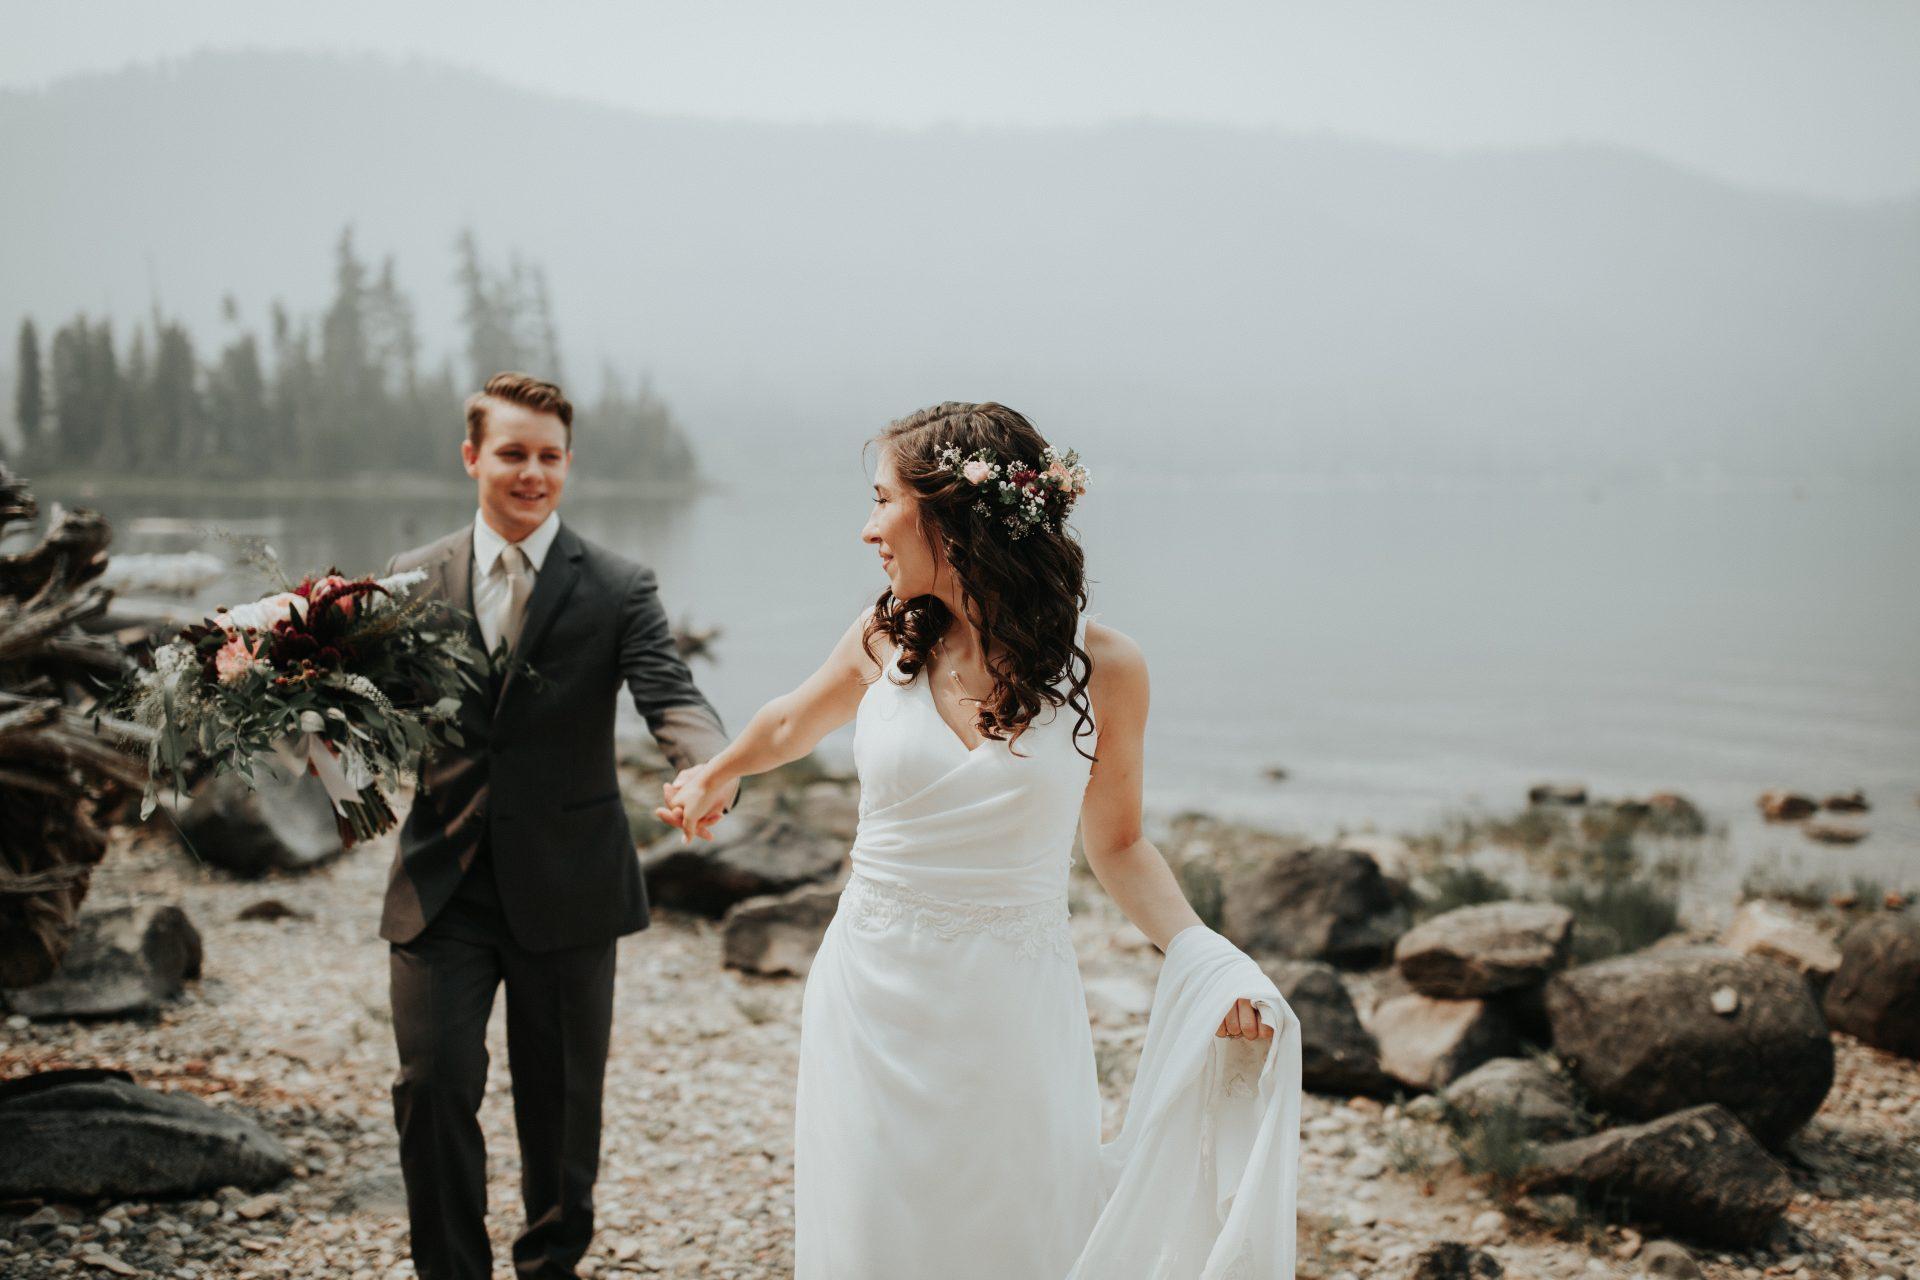 Mariage - © Benjaminrobyn Jespersen on Unsplash